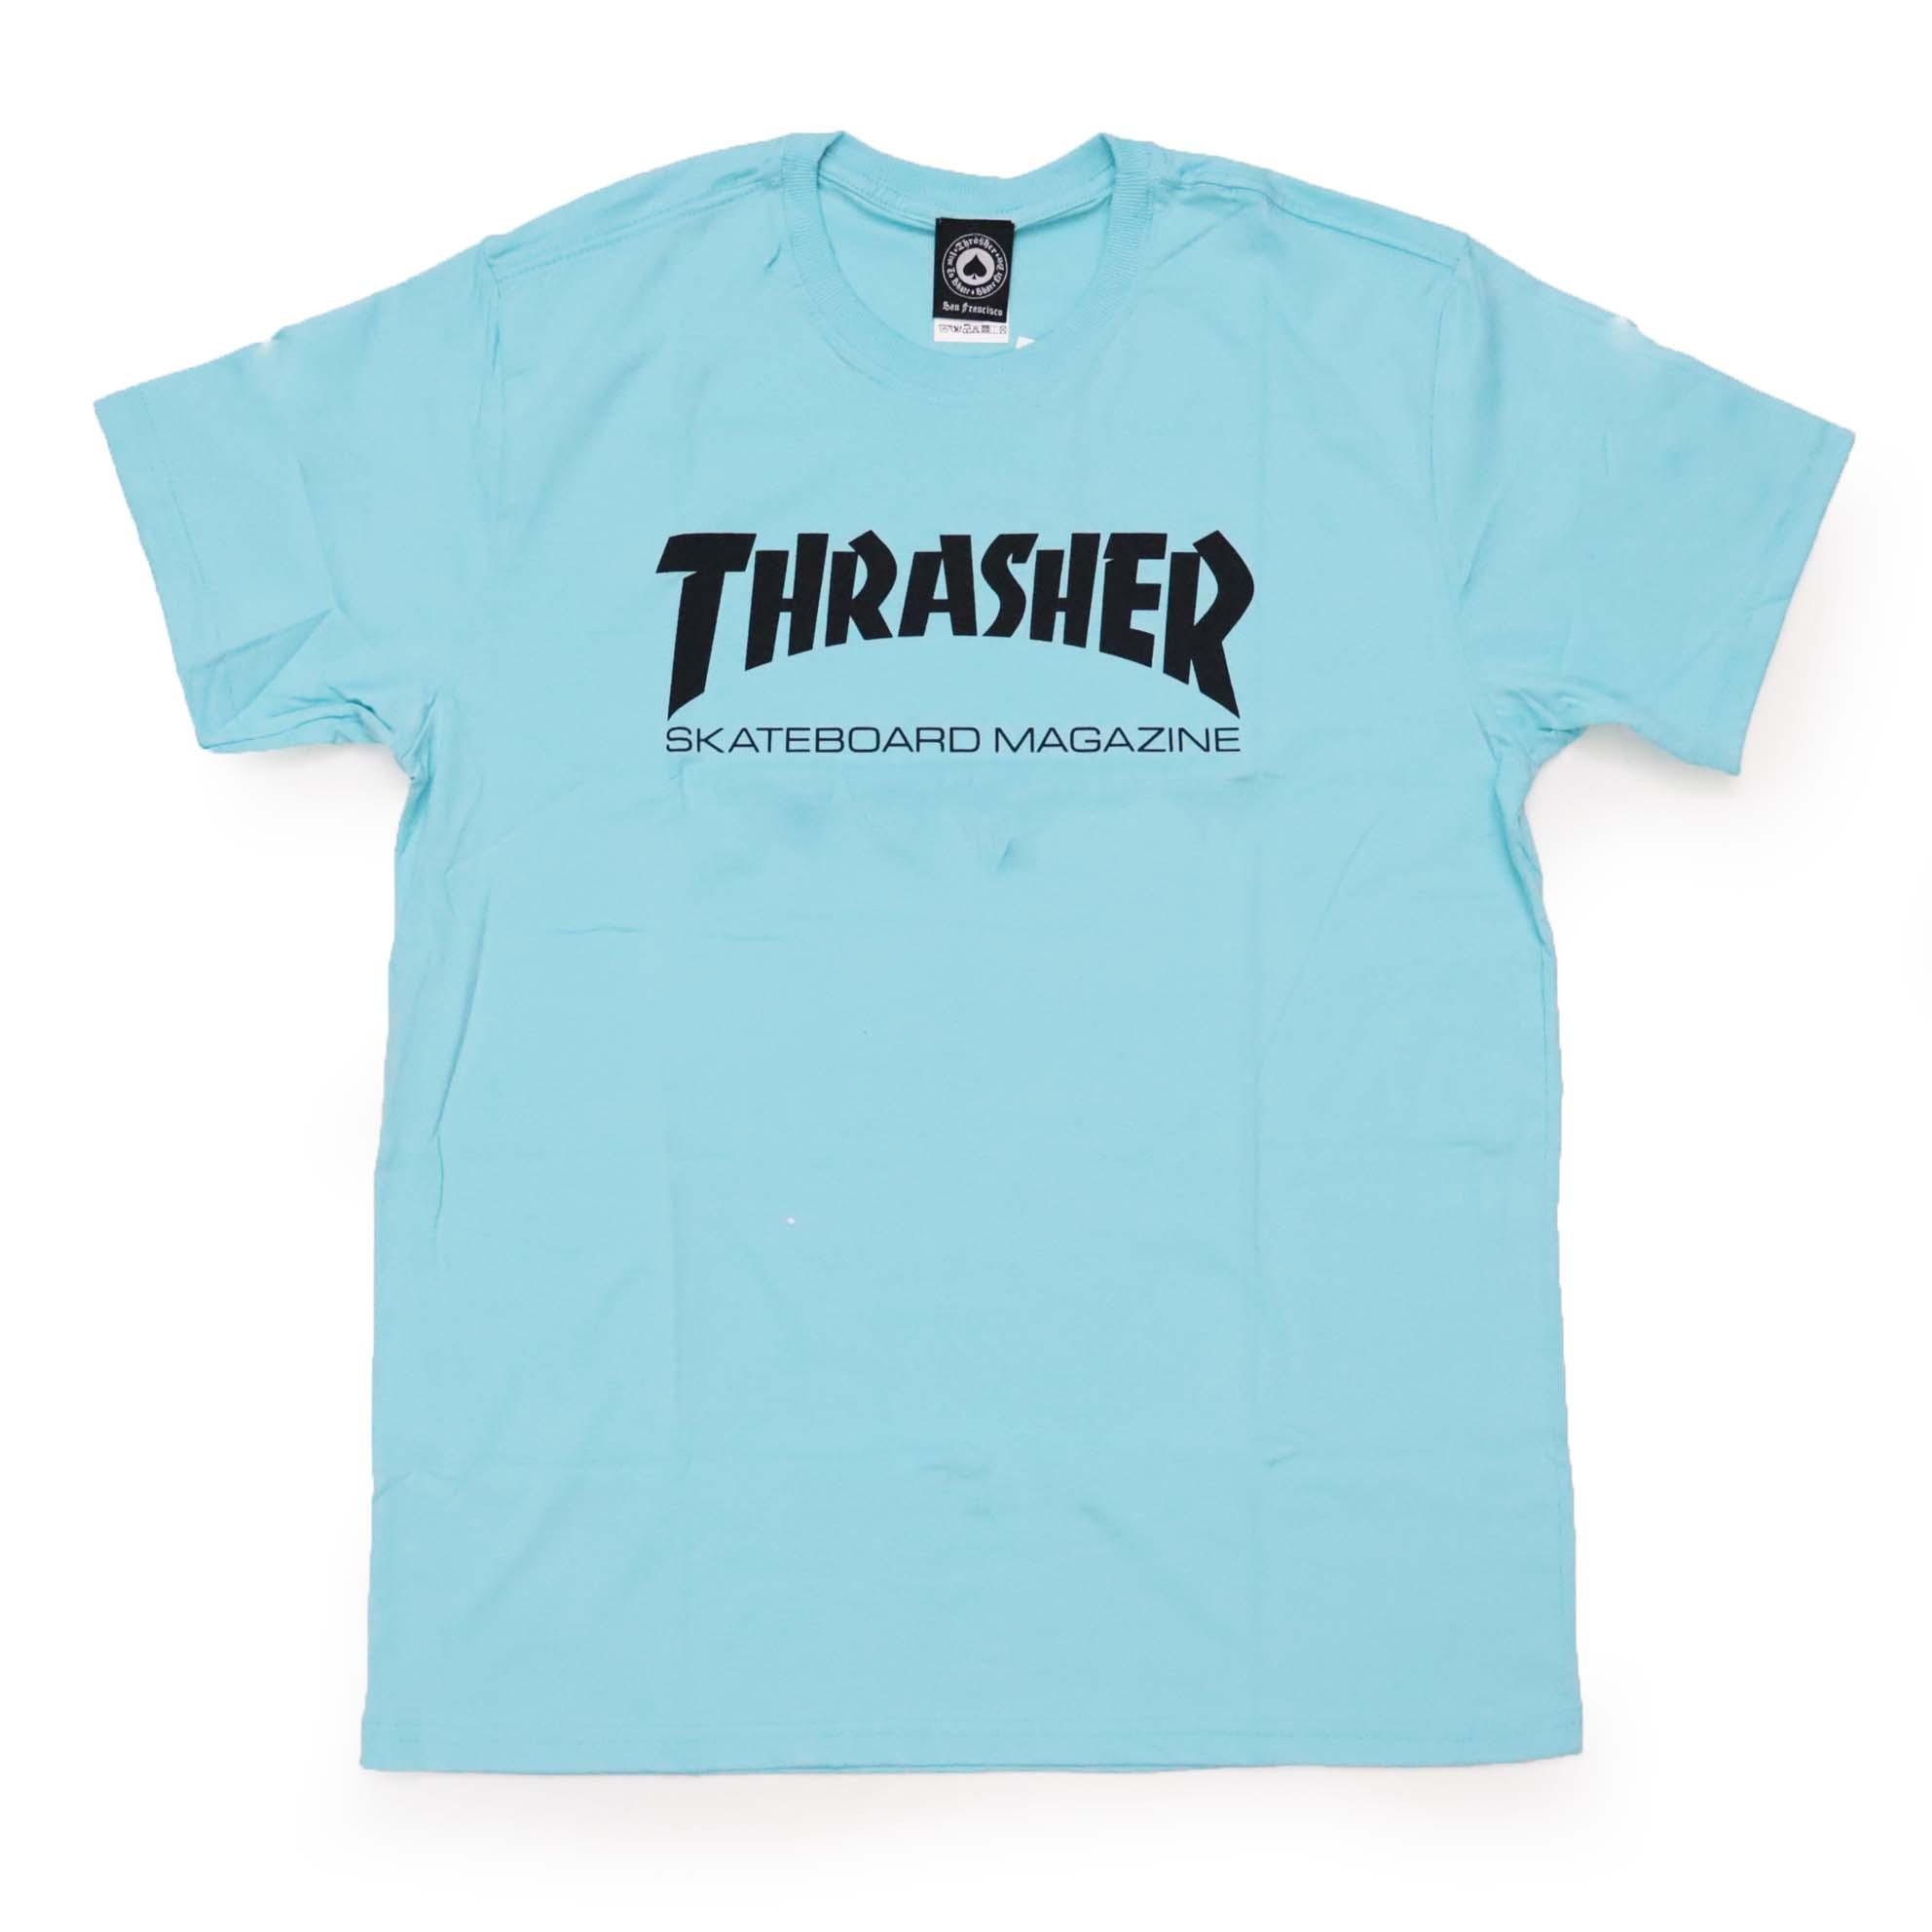 Camiseta Thrasher Magazine Skate Mag - Azul Claro